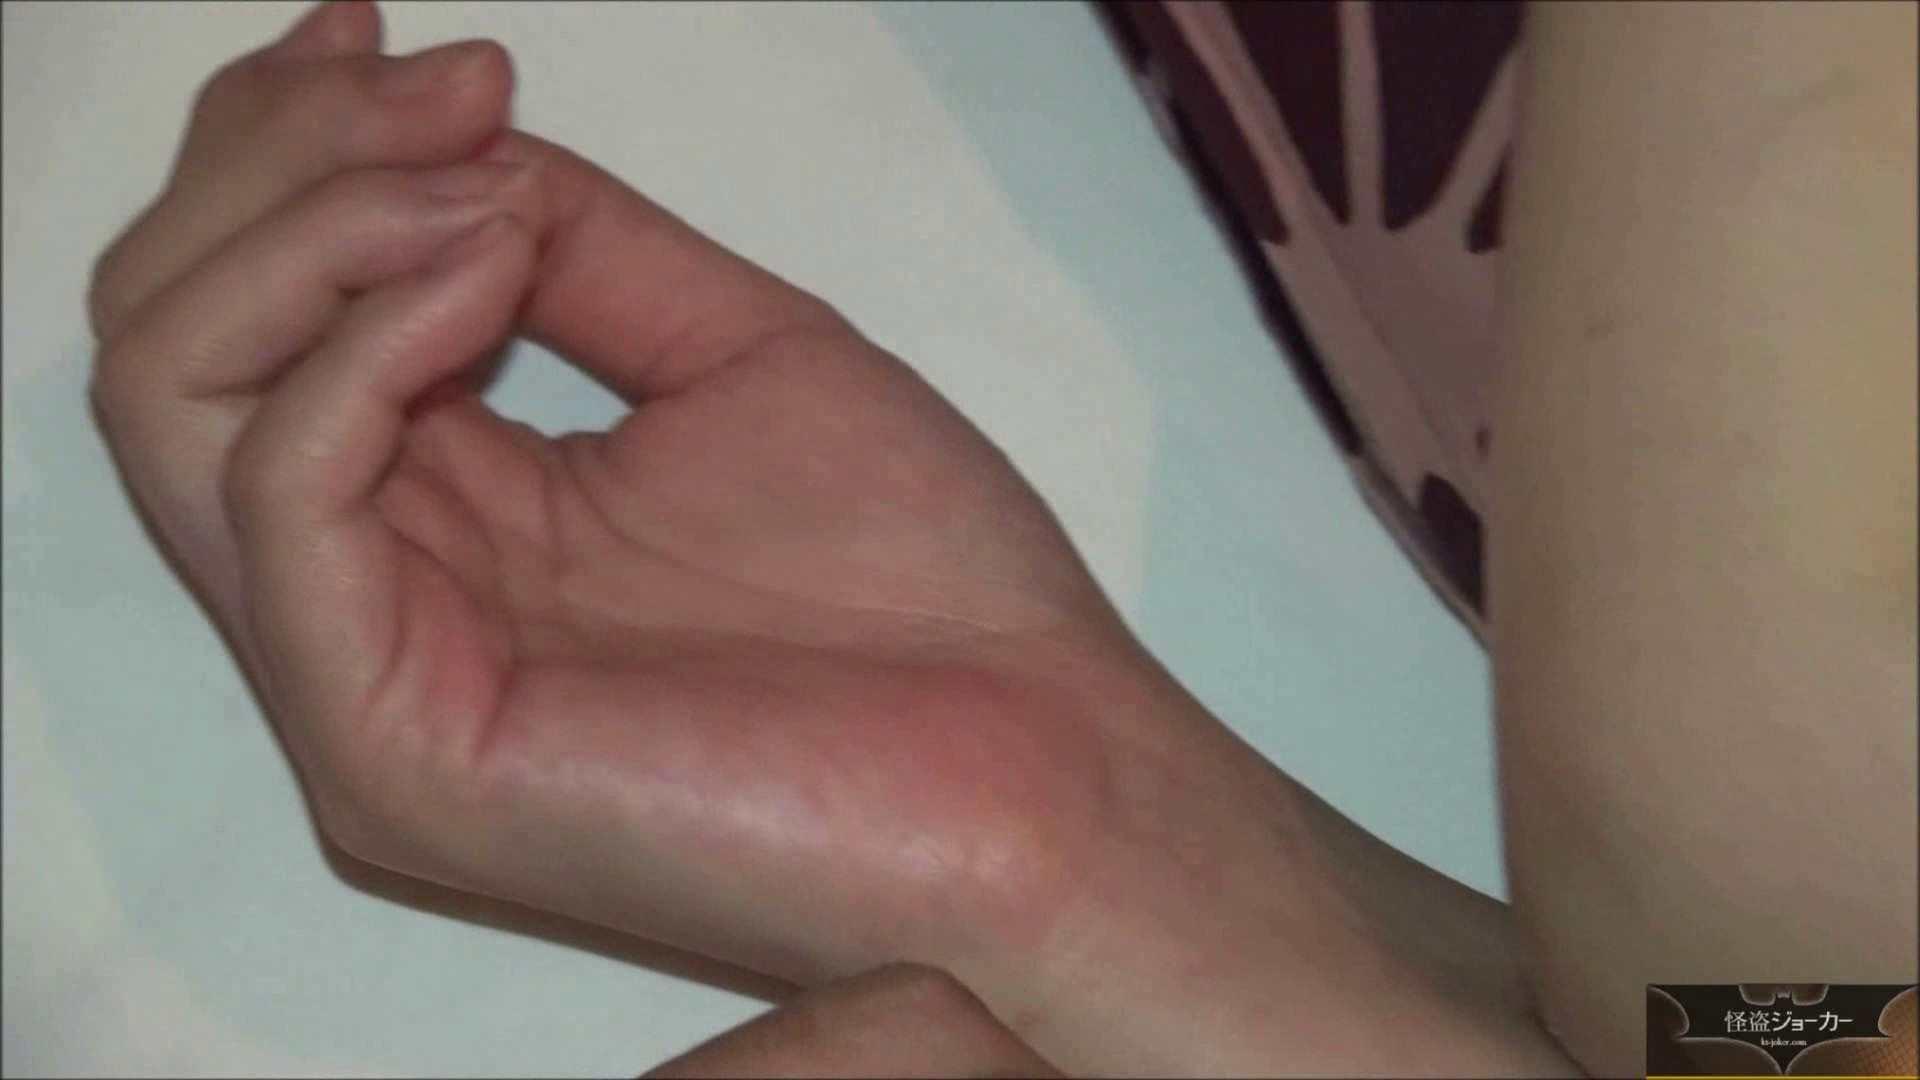 vol.3 【美人ショップ店員】杏奈ちゃん☆コンパで一気連発w 丸見え AV動画キャプチャ 78画像 3